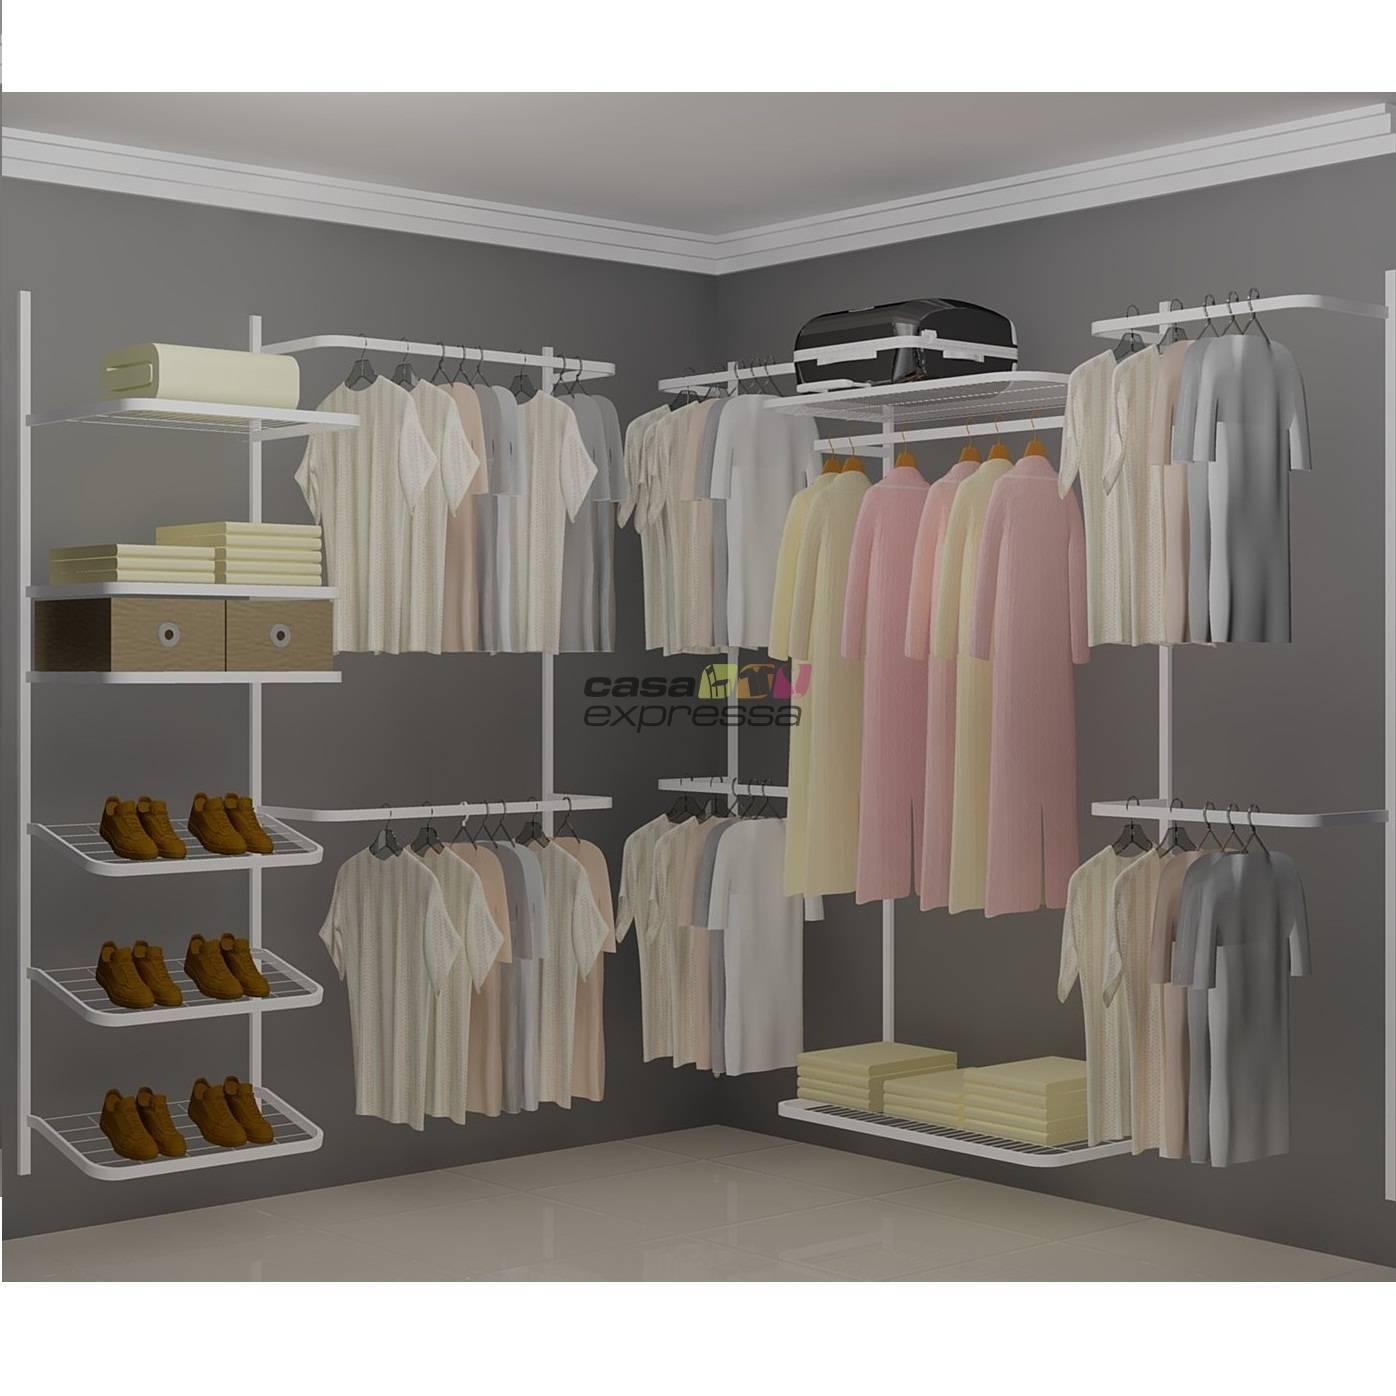 Closet Aramado em L  CLN04 - 2,20 x 2,20m - CASA EXPRESSA